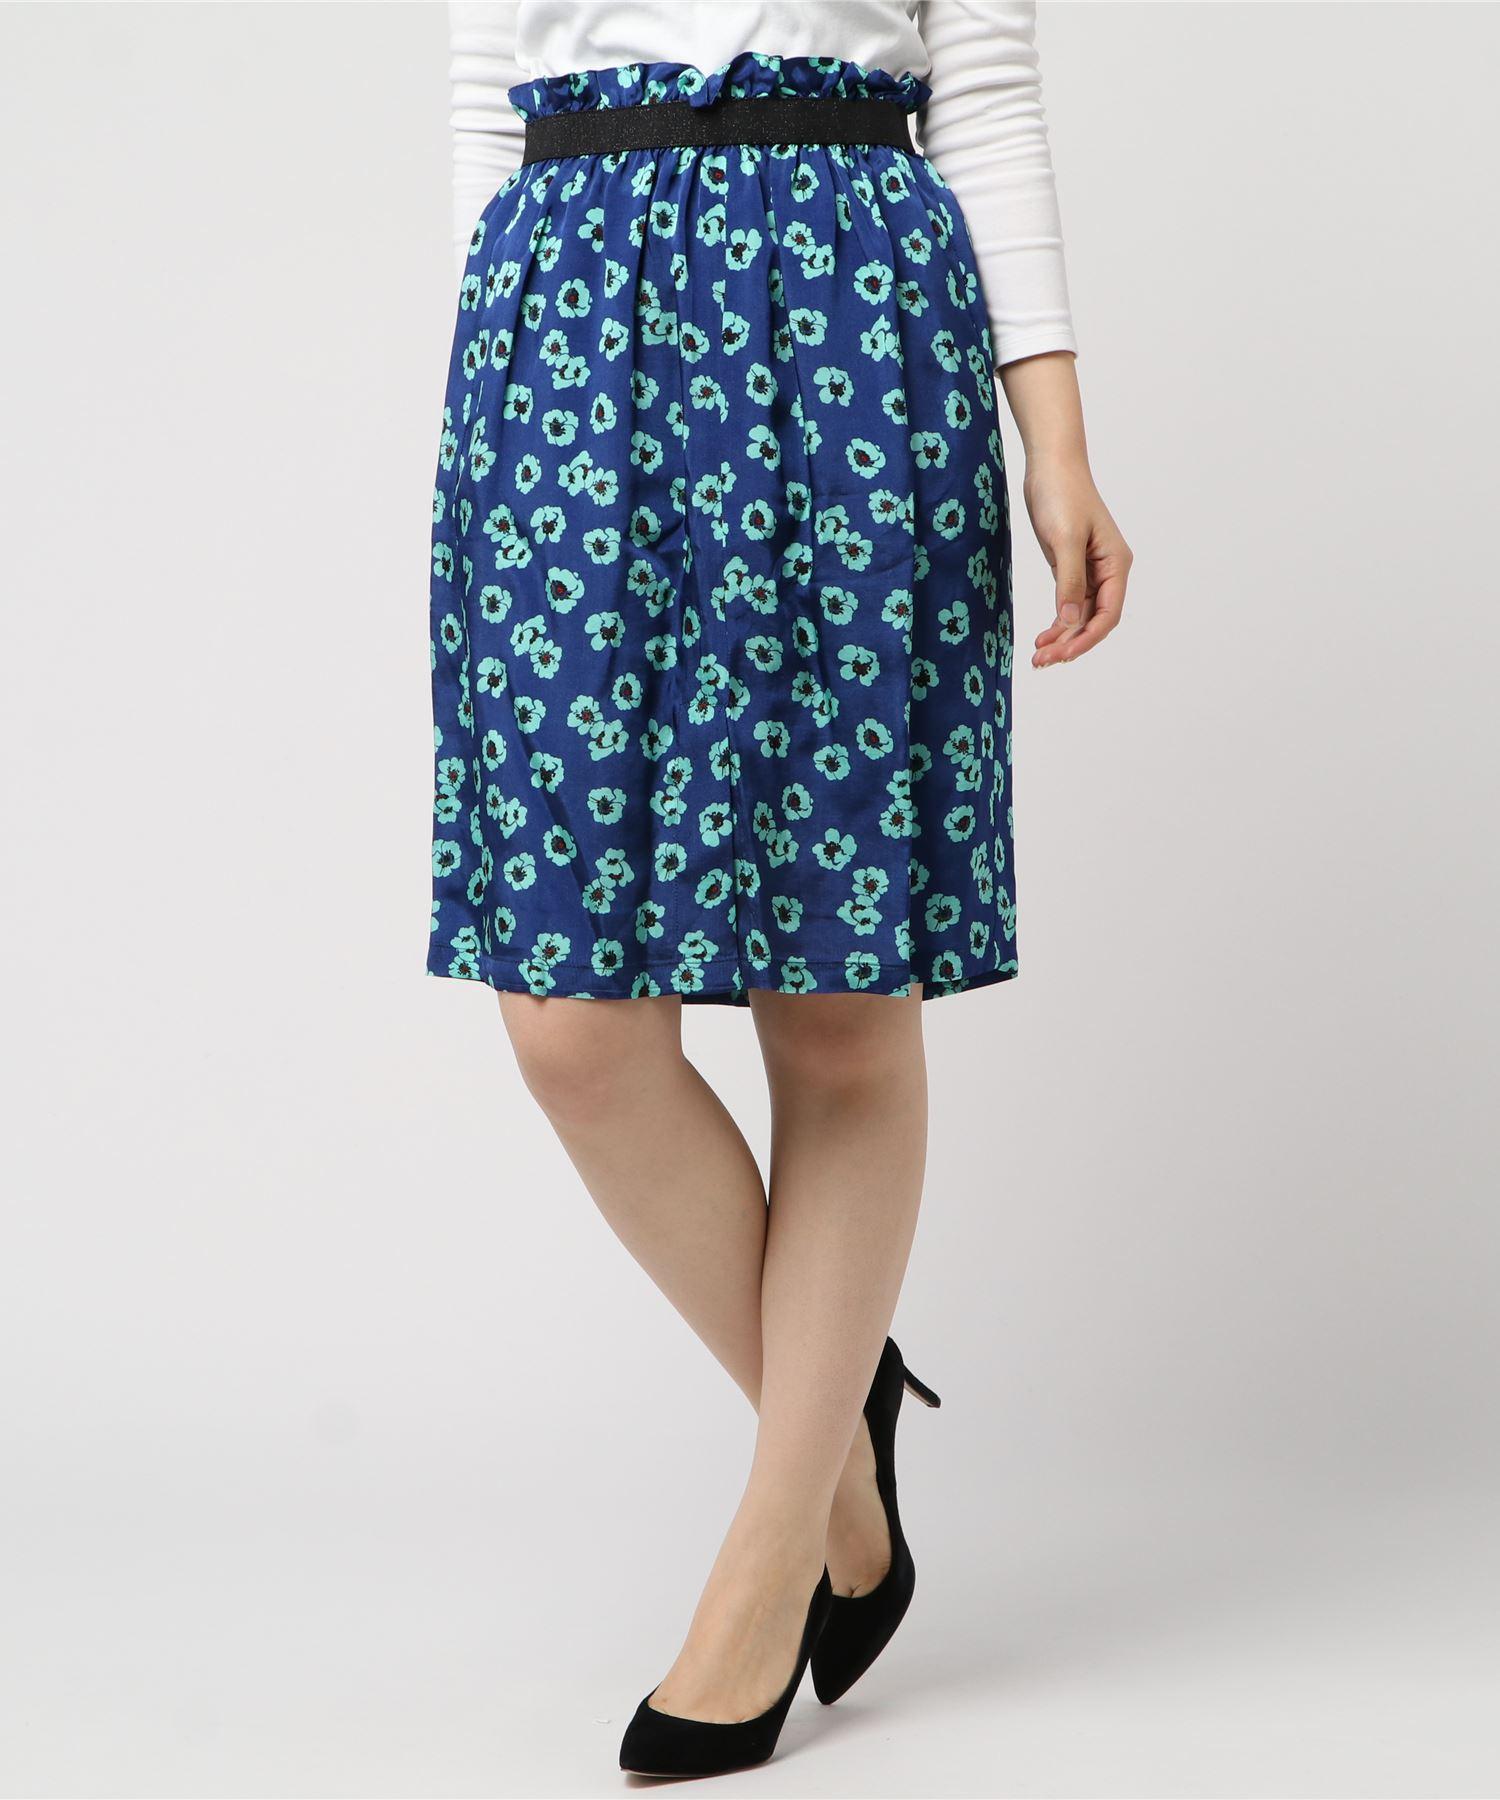 SUZiE WiNKLE スージウィンクル / CAMERIA プリントスカート